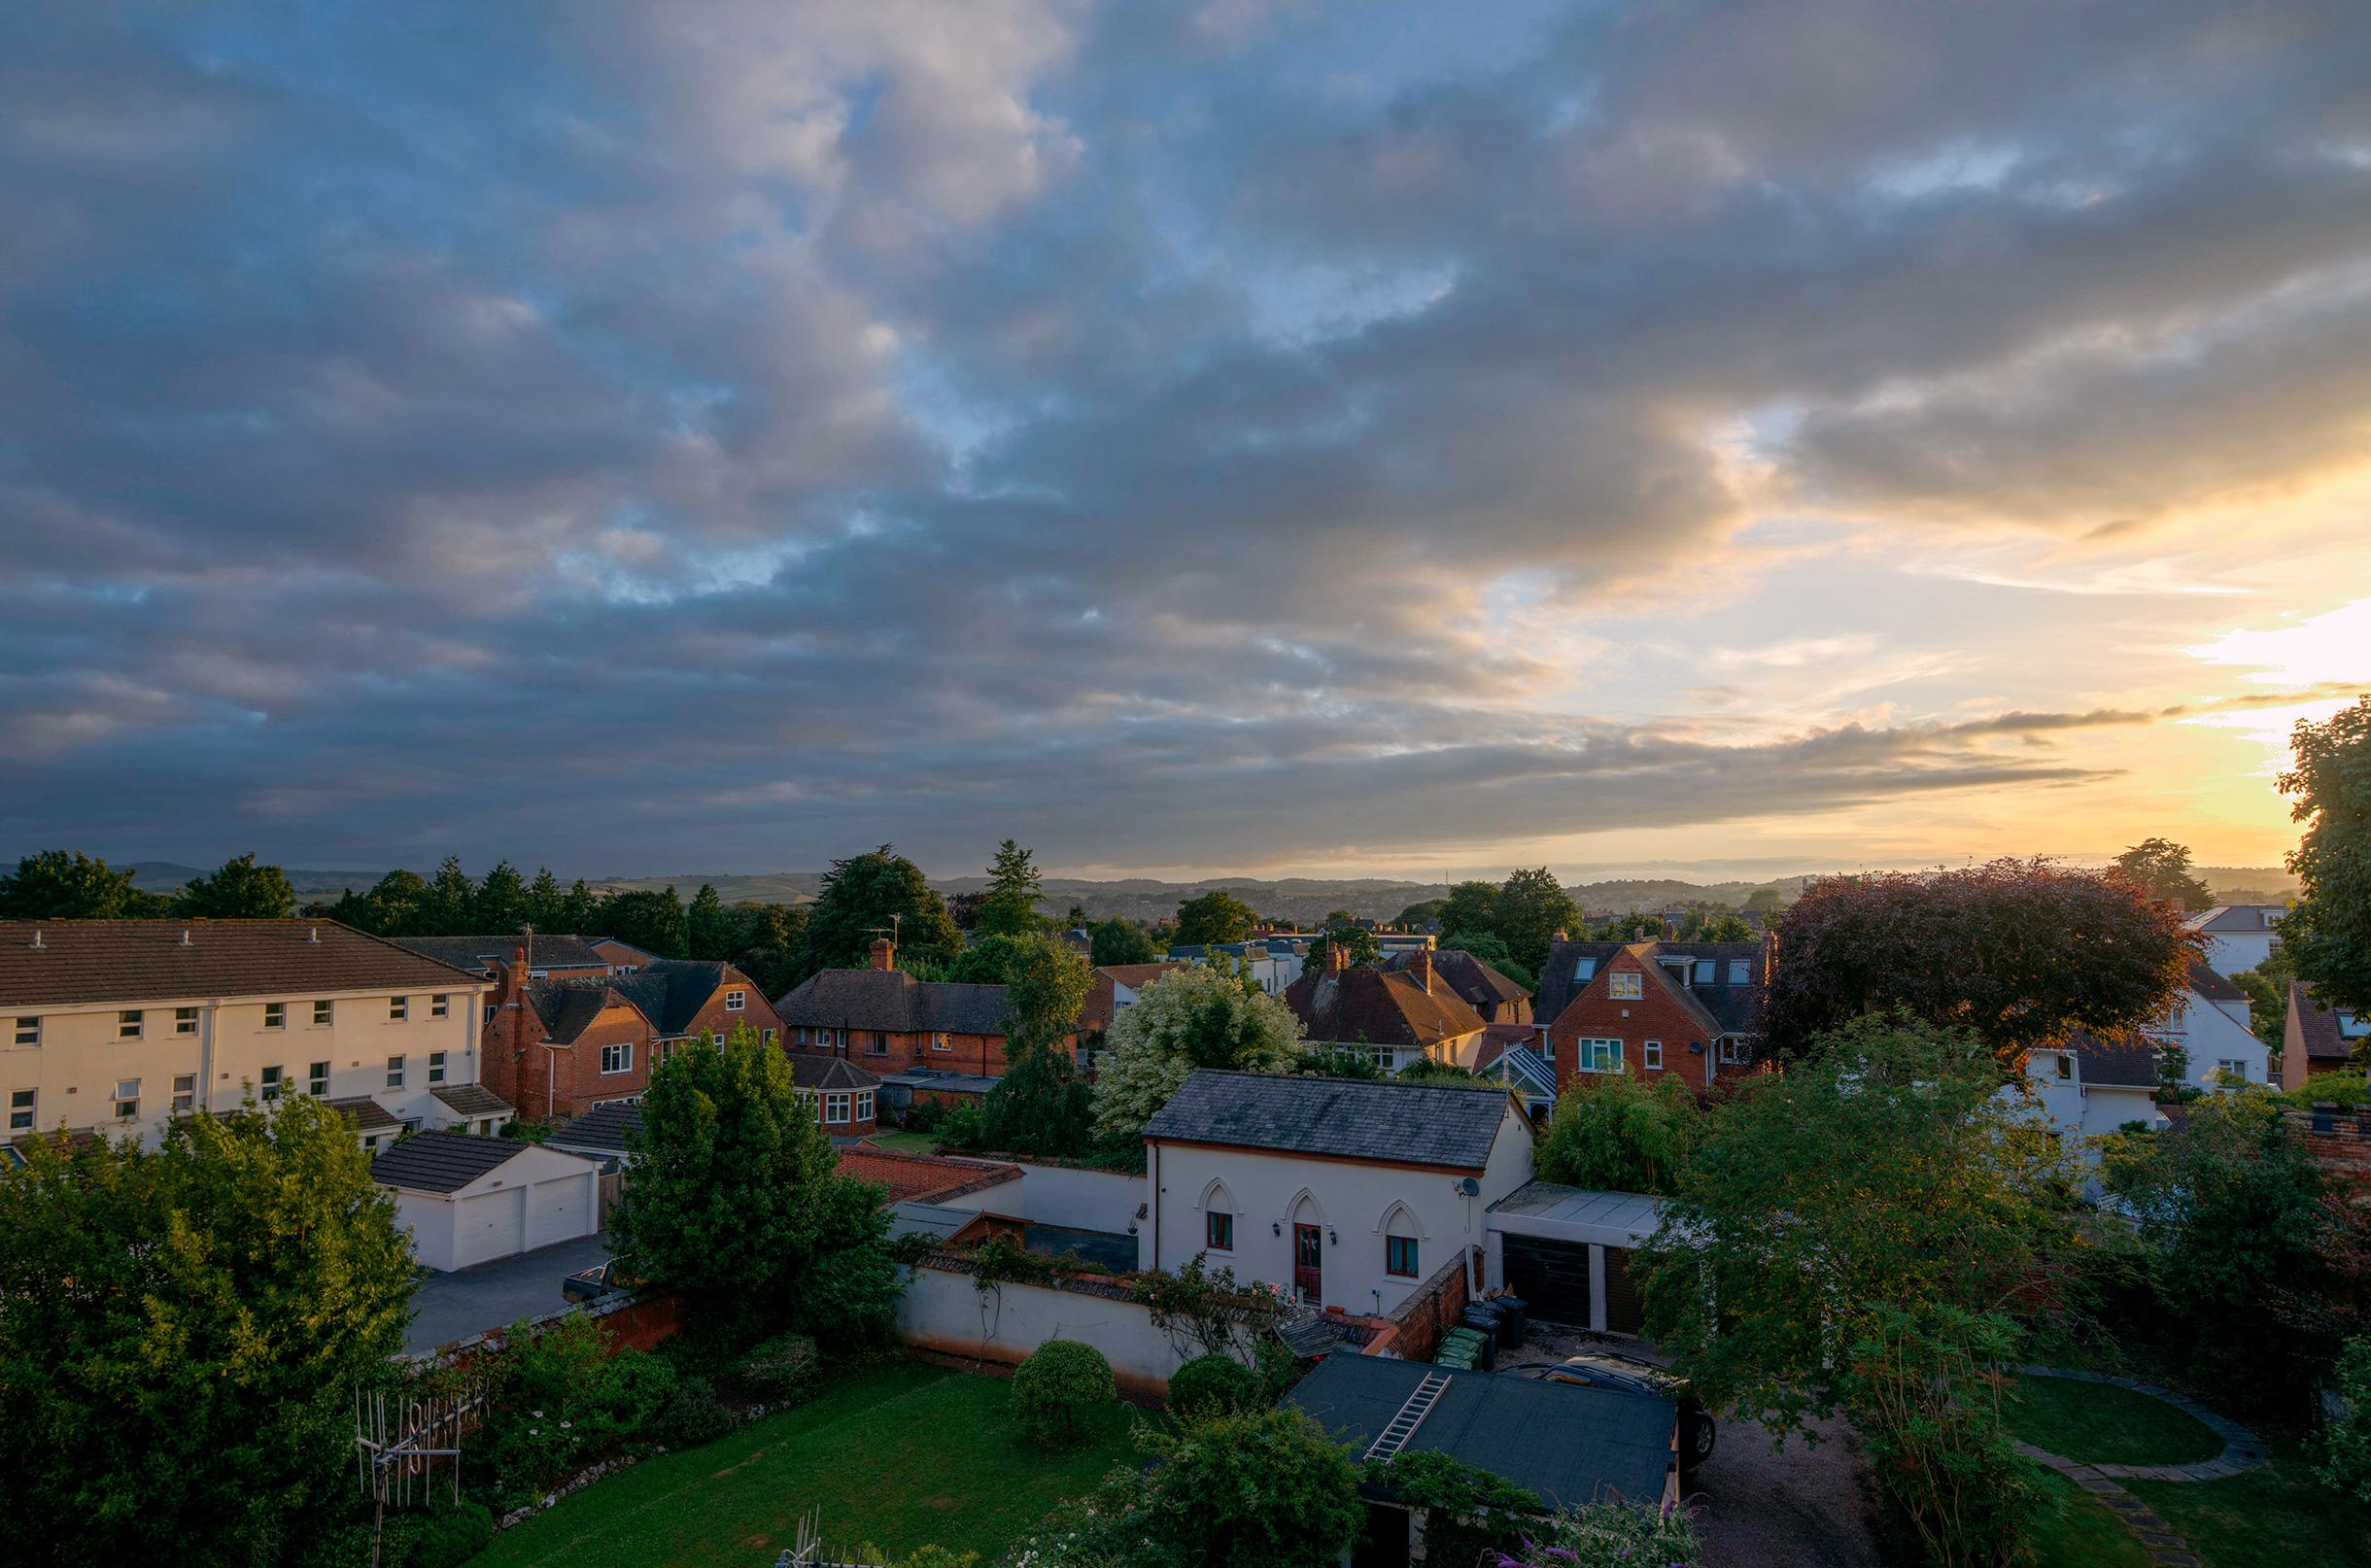 Exeter, UK At Sunset